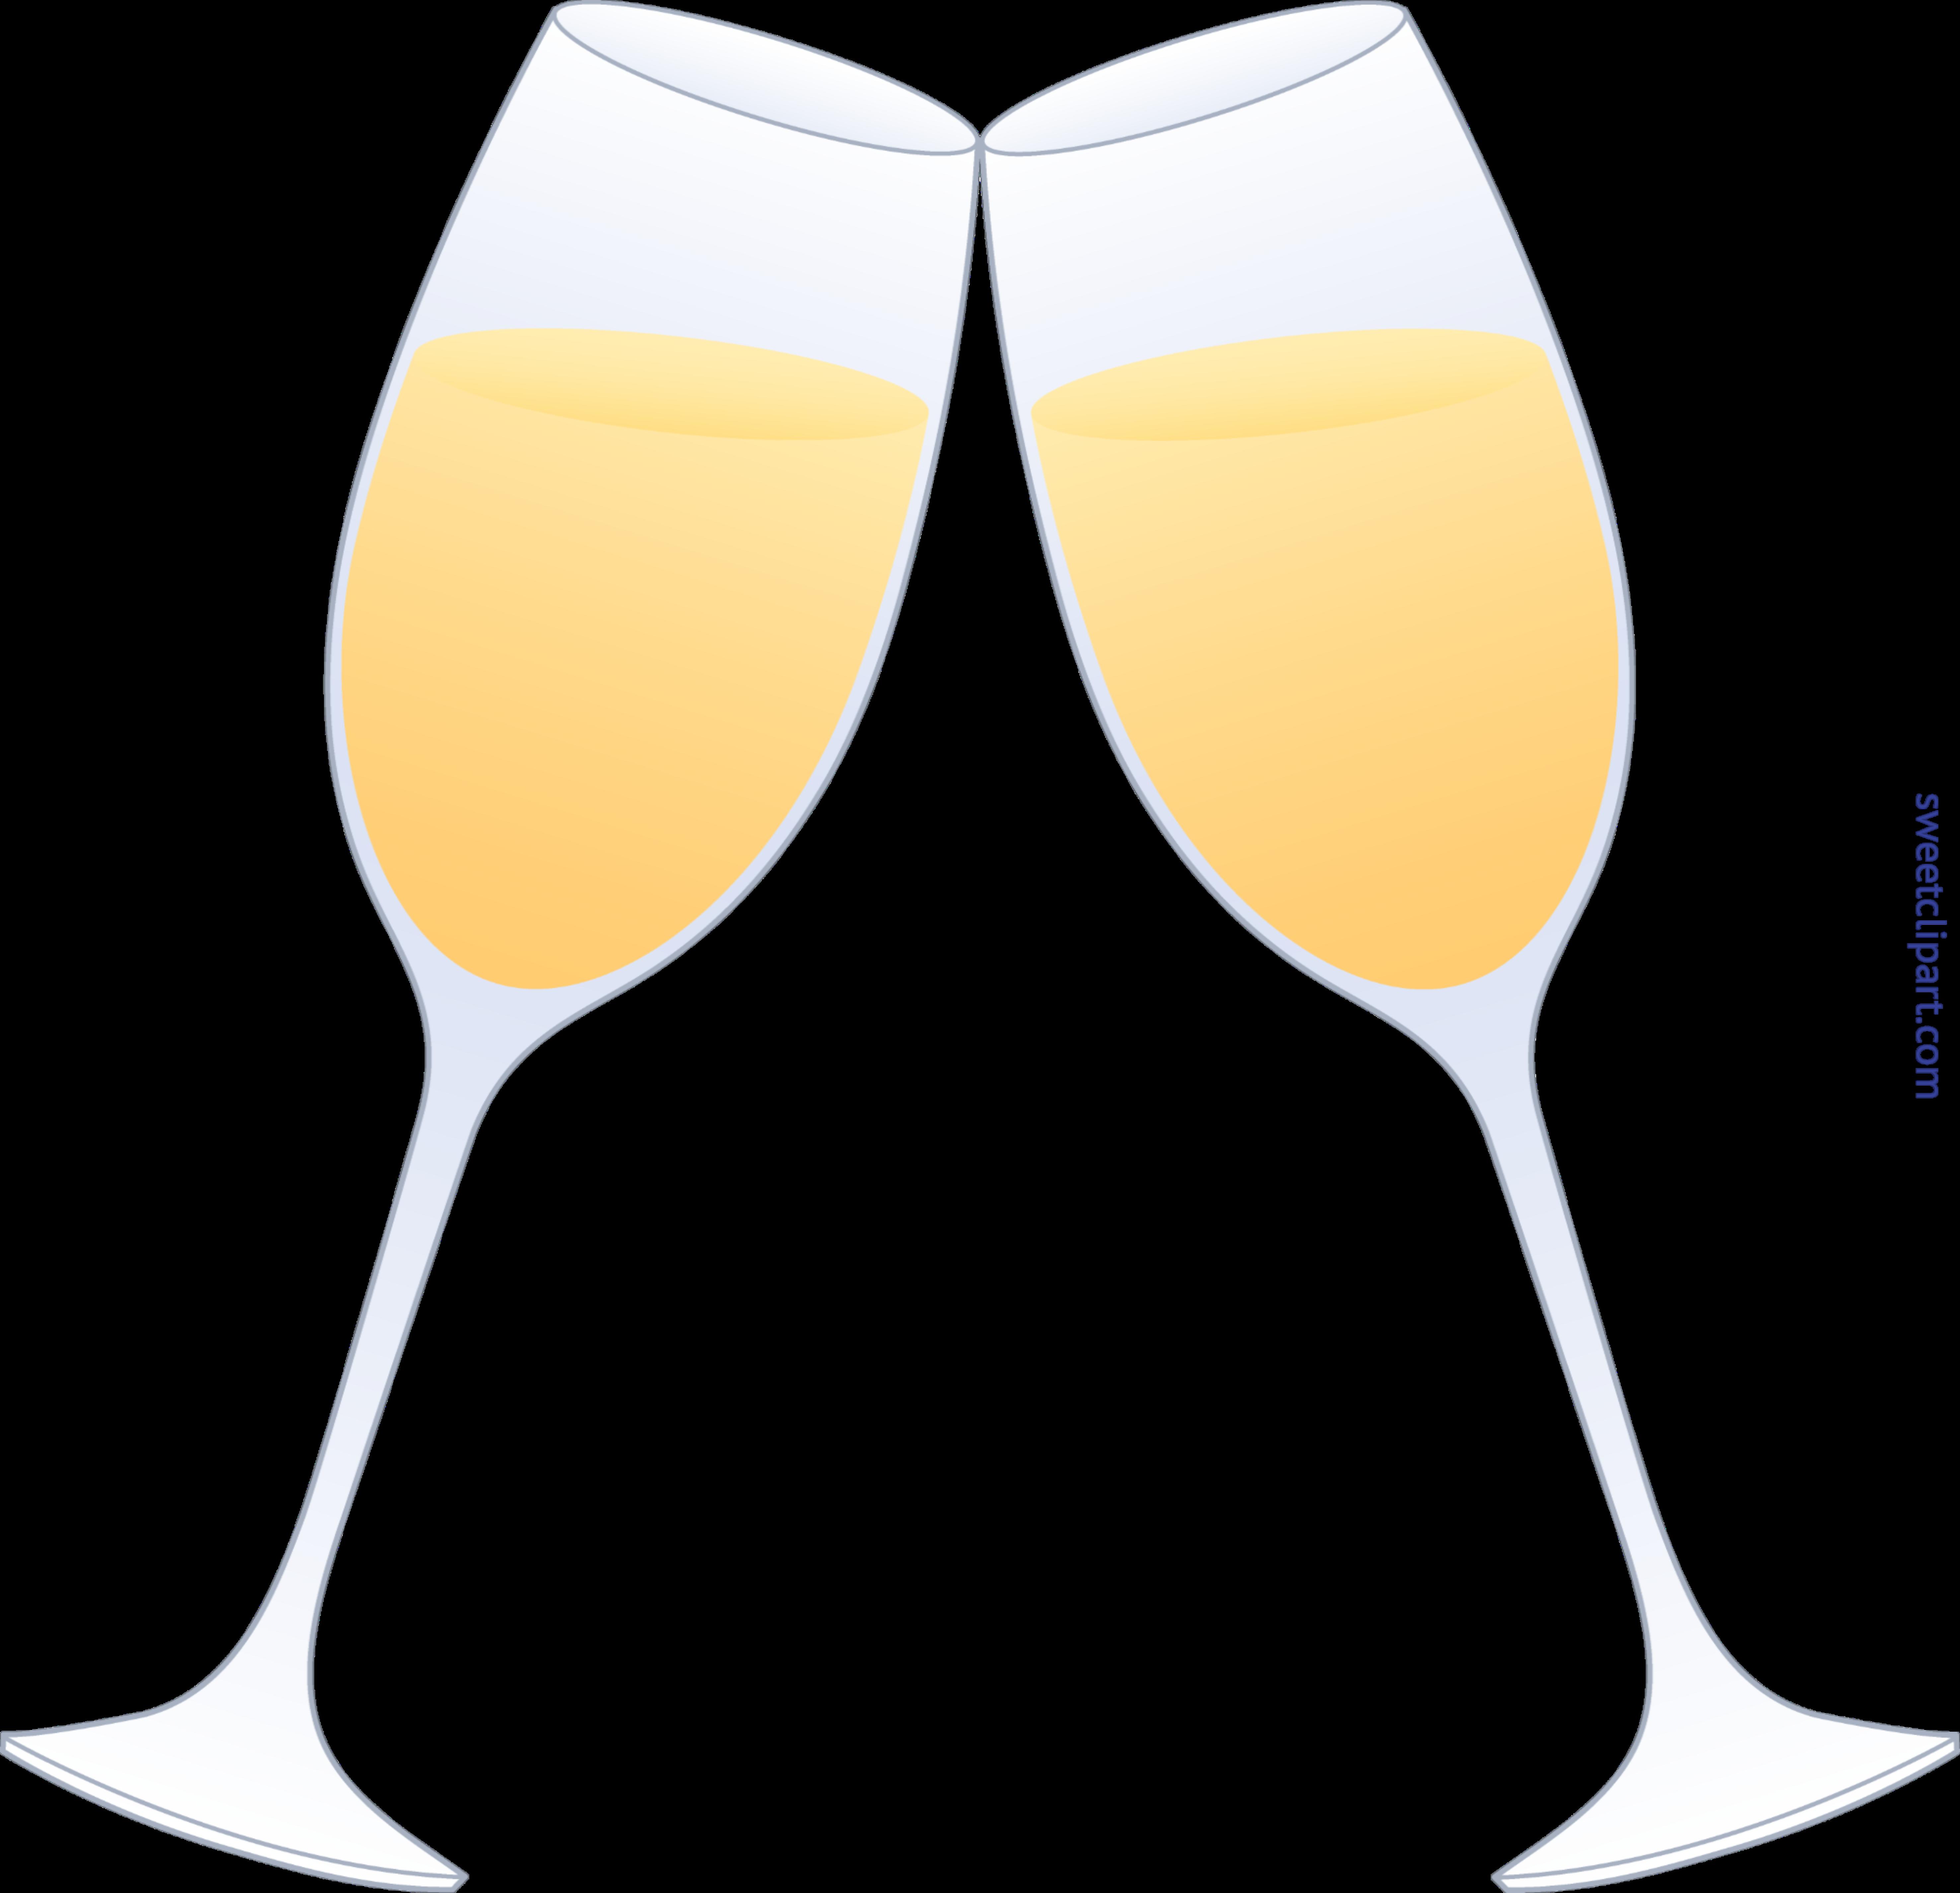 Champagne glasses clip art. Flutes clipart svg